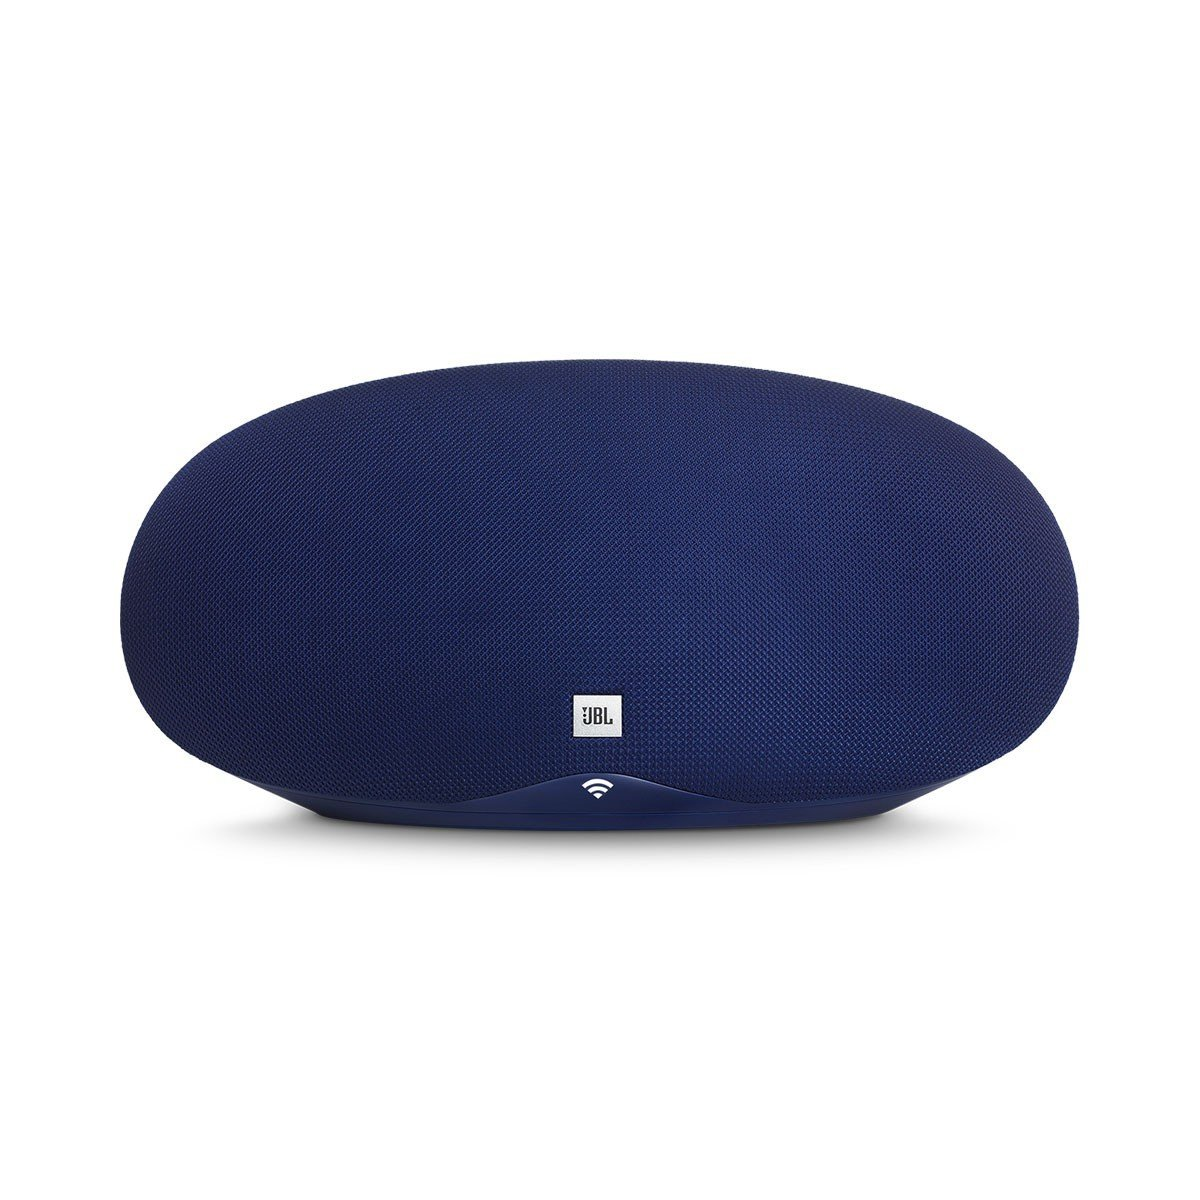 JBL Playlist 150 Wireless with Built-in Chromecast Speaker, Blue